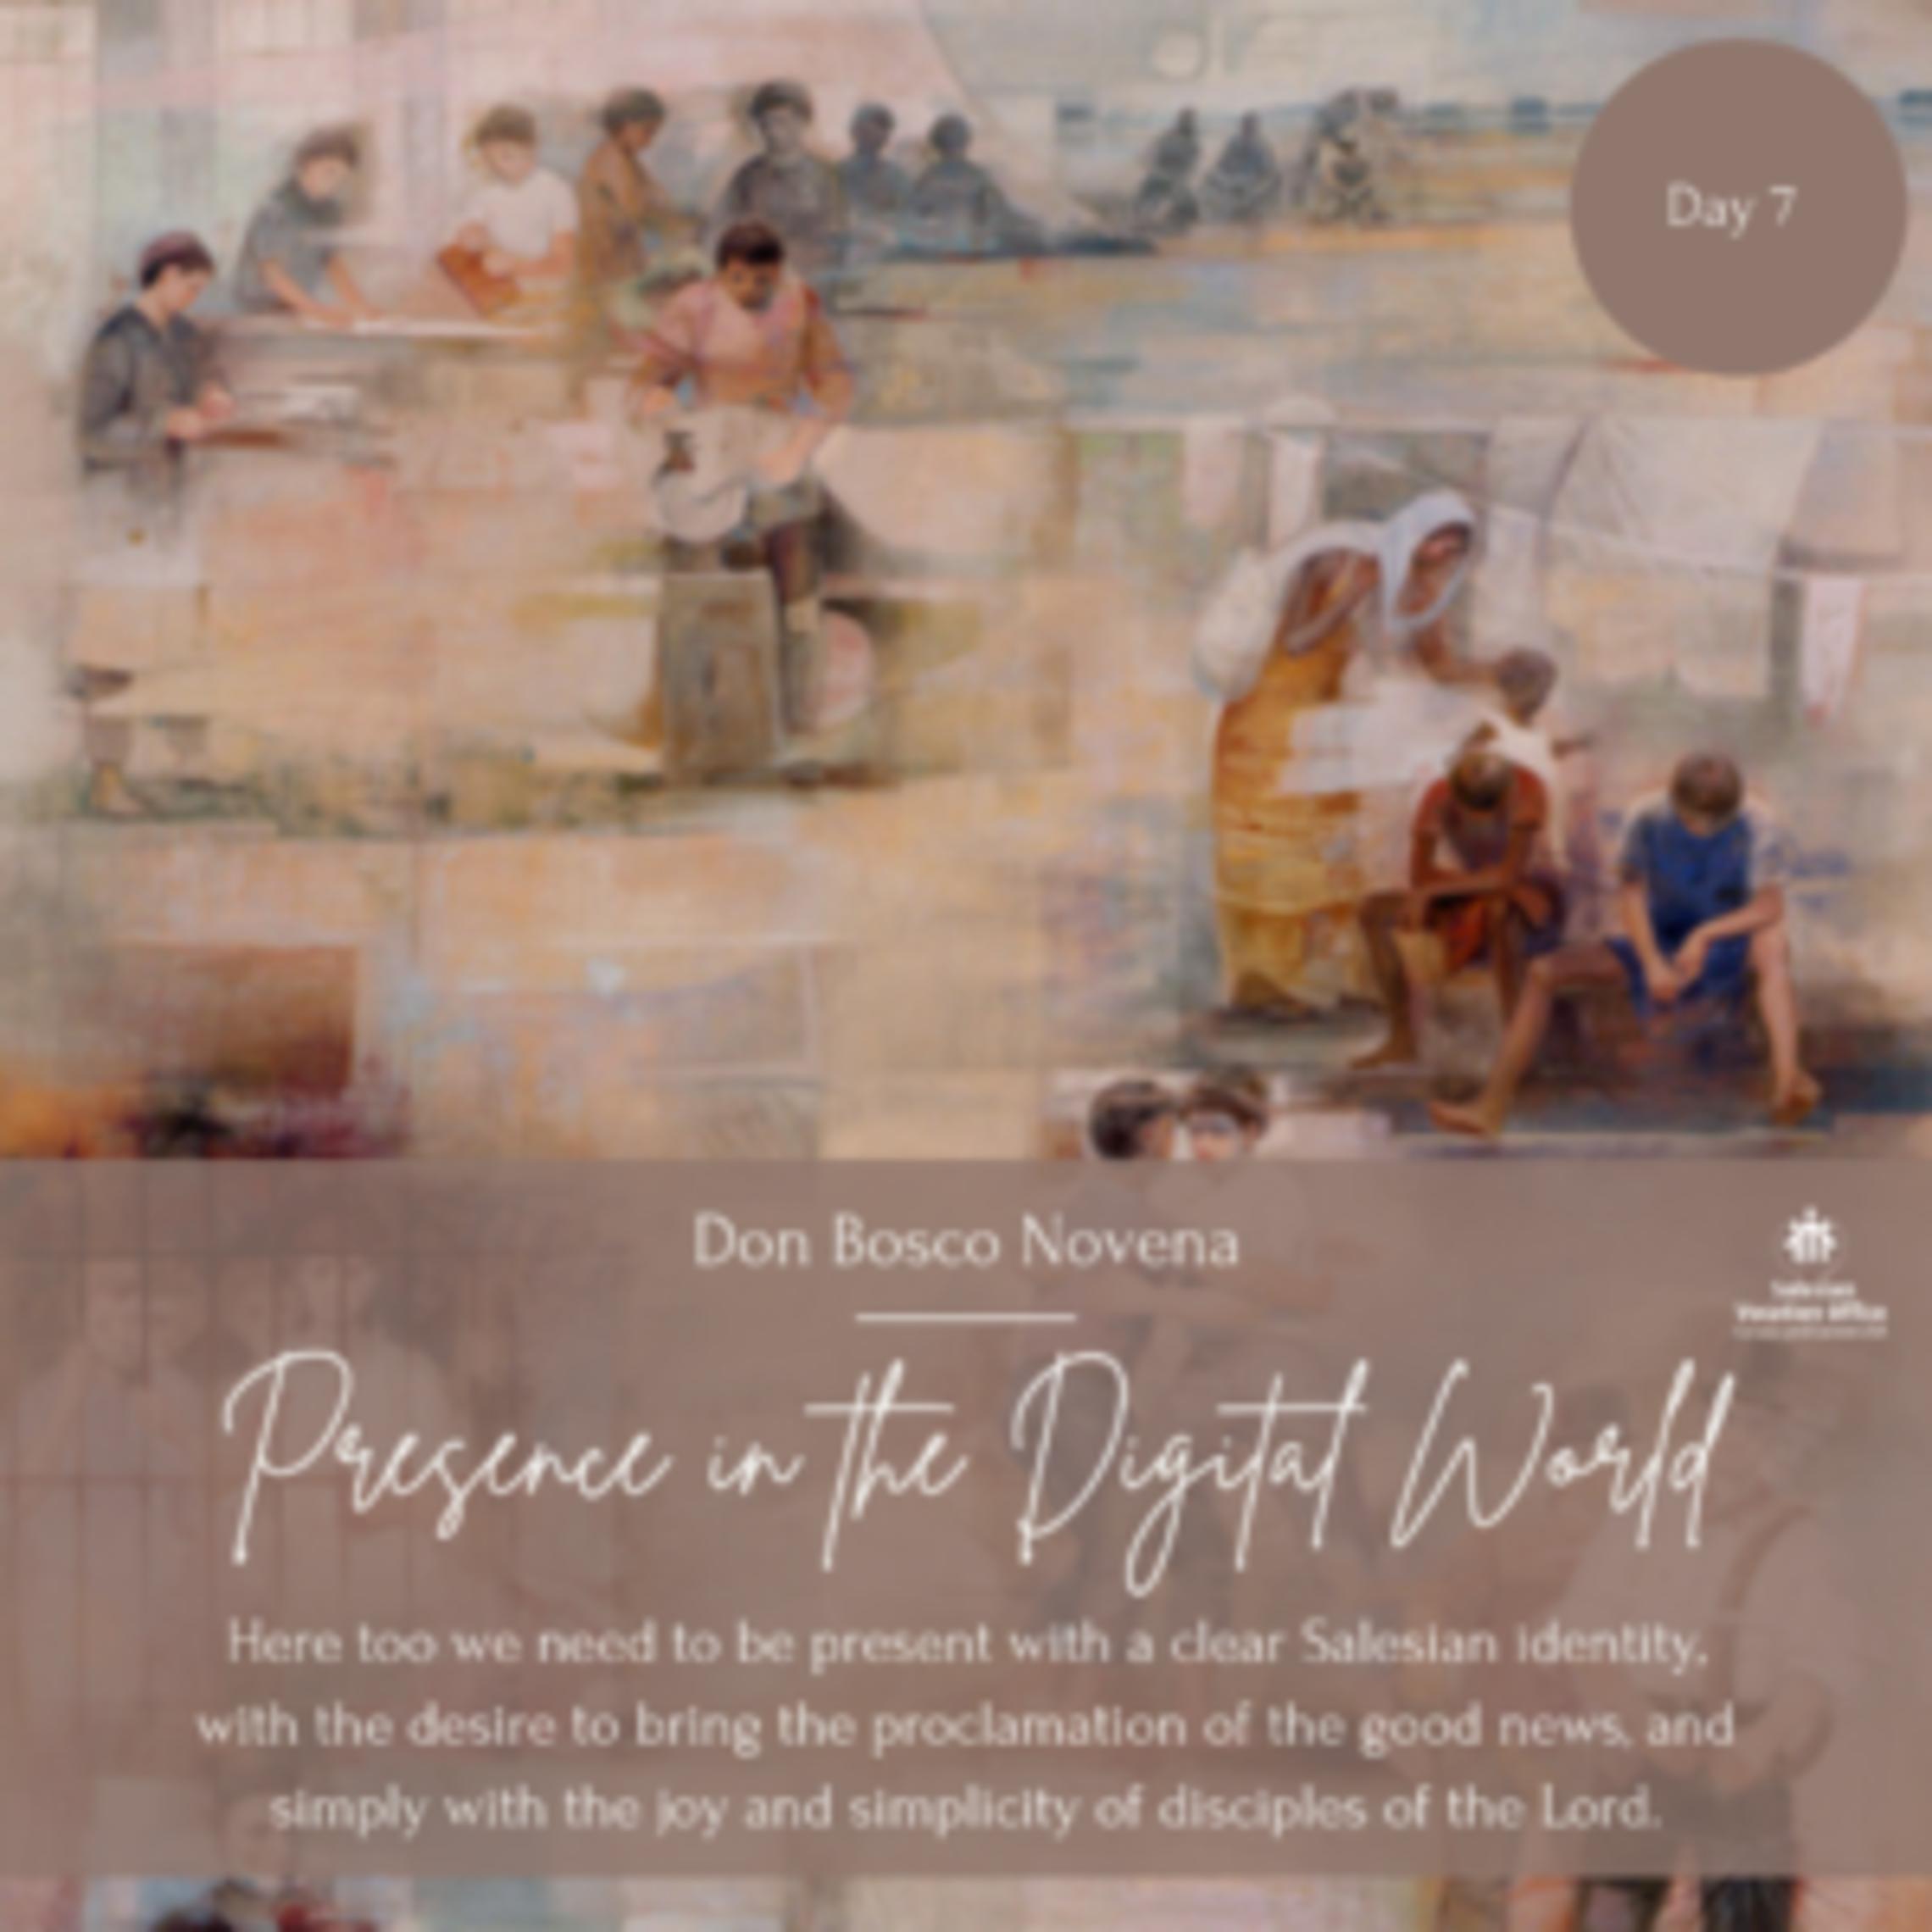 Presence in the Digital World